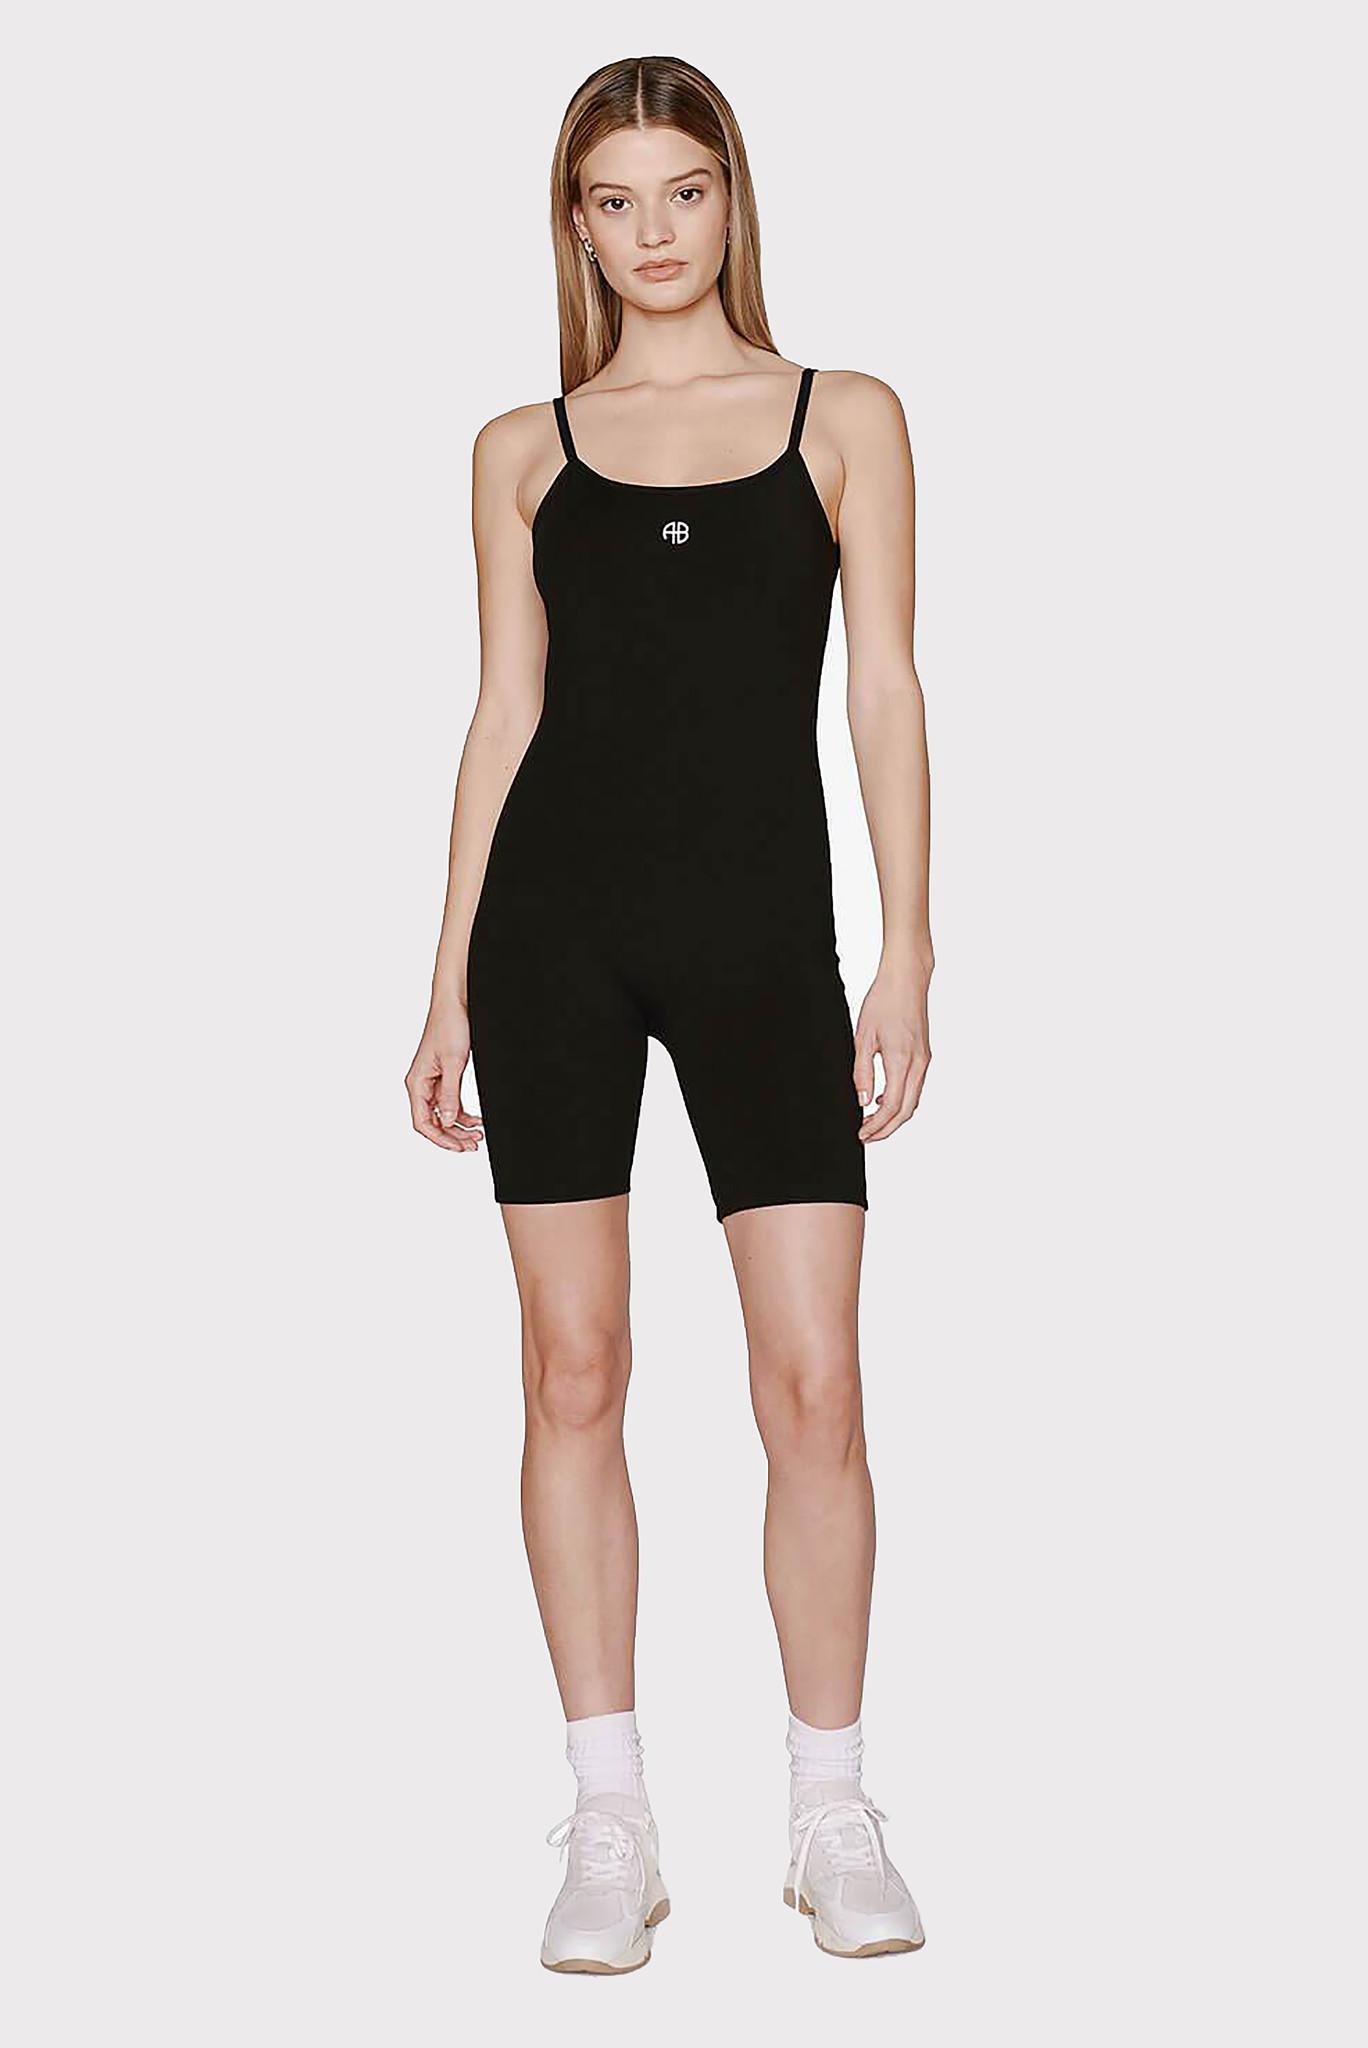 Anine Bing jumpsuit Beatrice S-02-9176-000 zwart